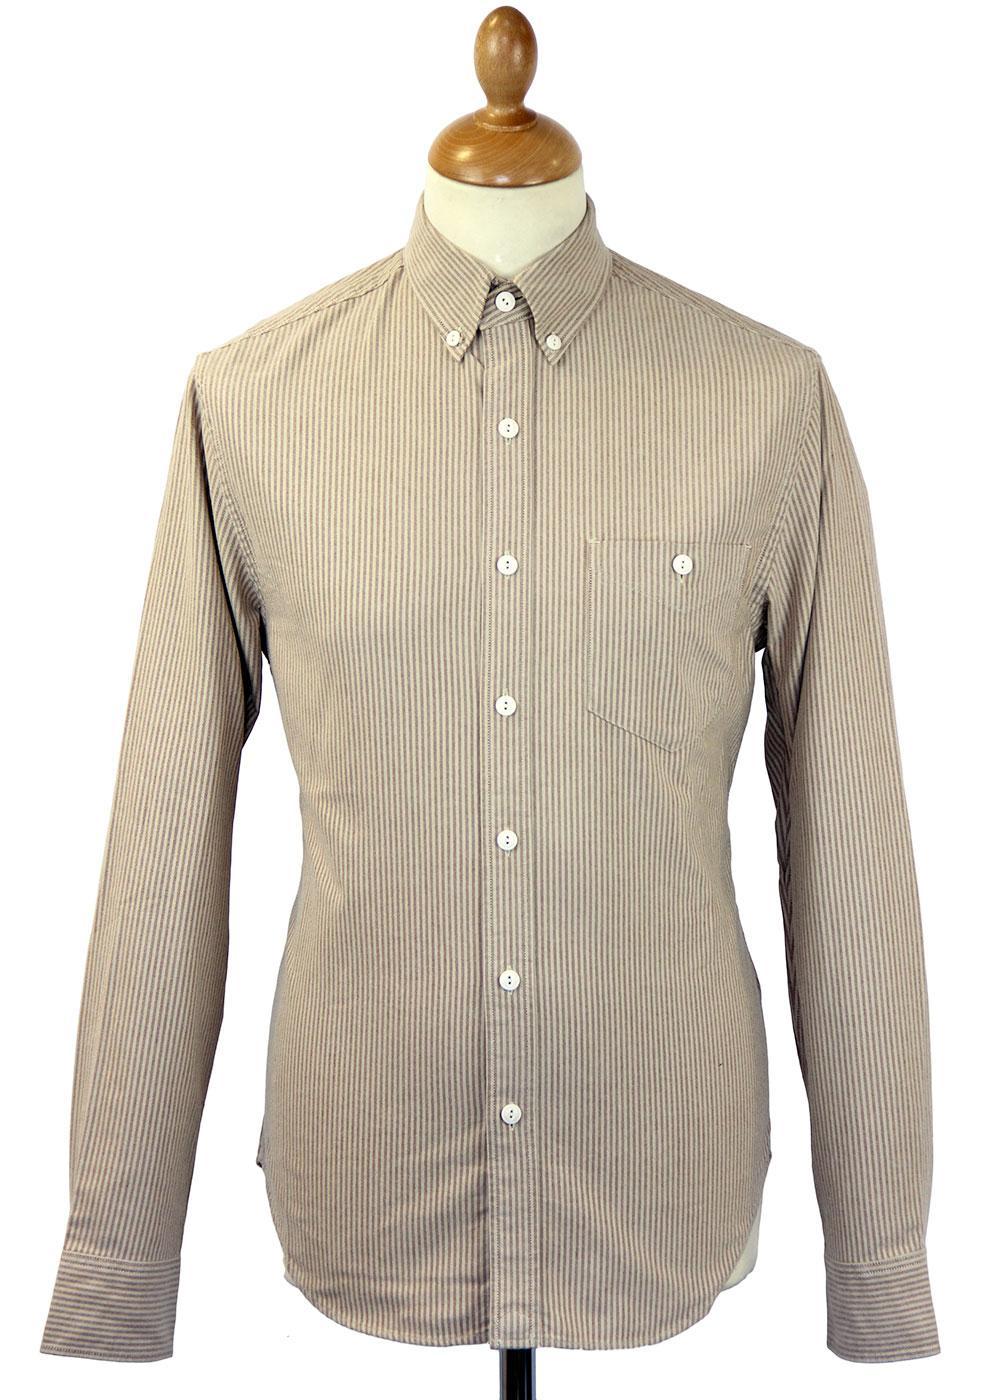 Lowell Pendleton Retro Mod Stripe Oxford Shirt (R)